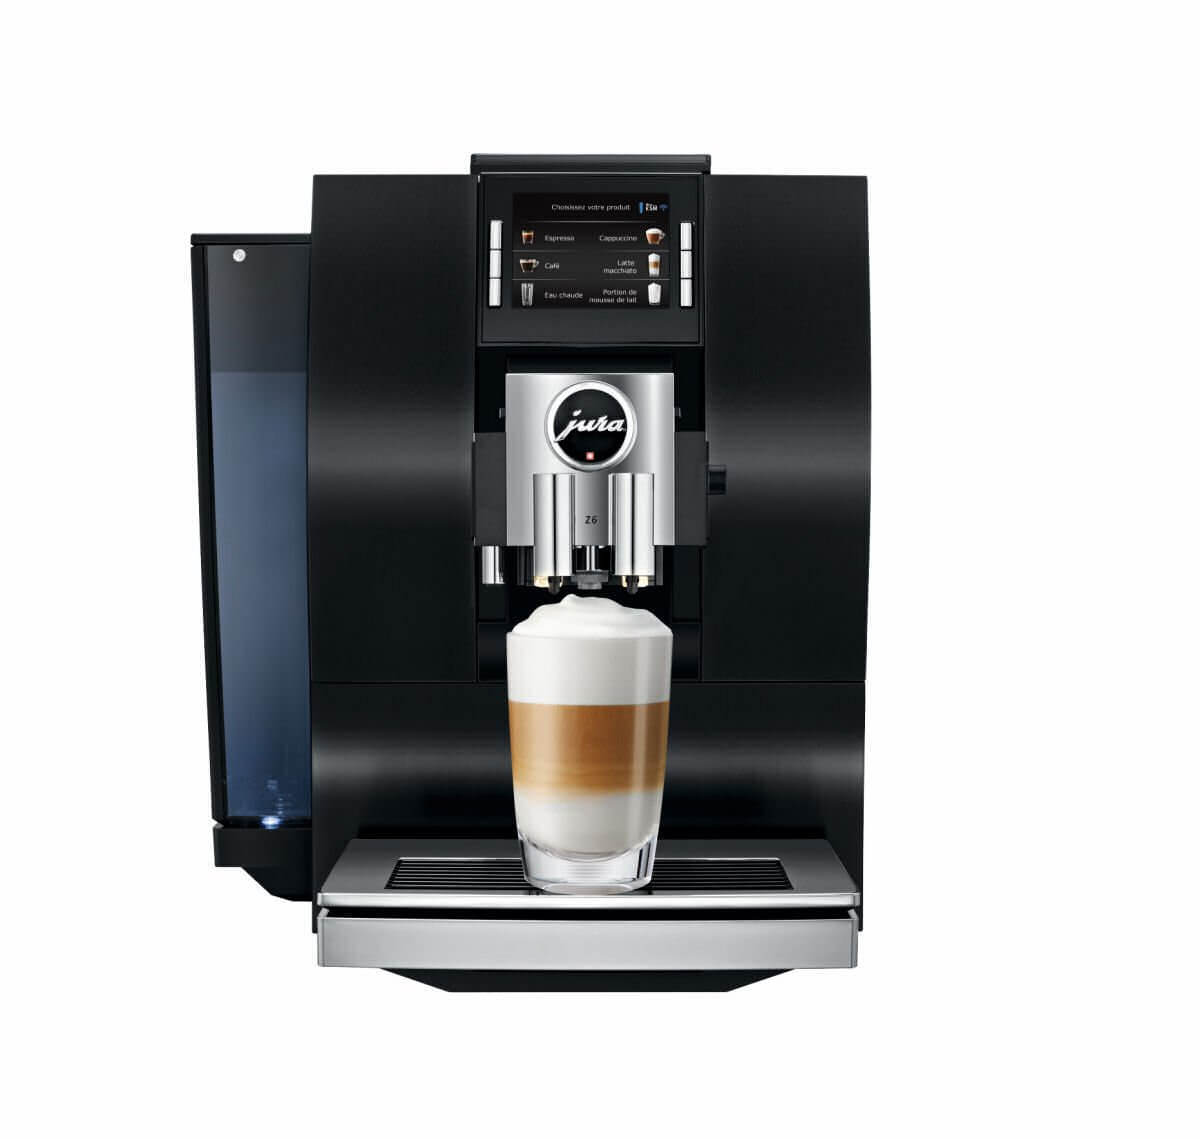 machine automatique jura 76 alu noire 15231 2